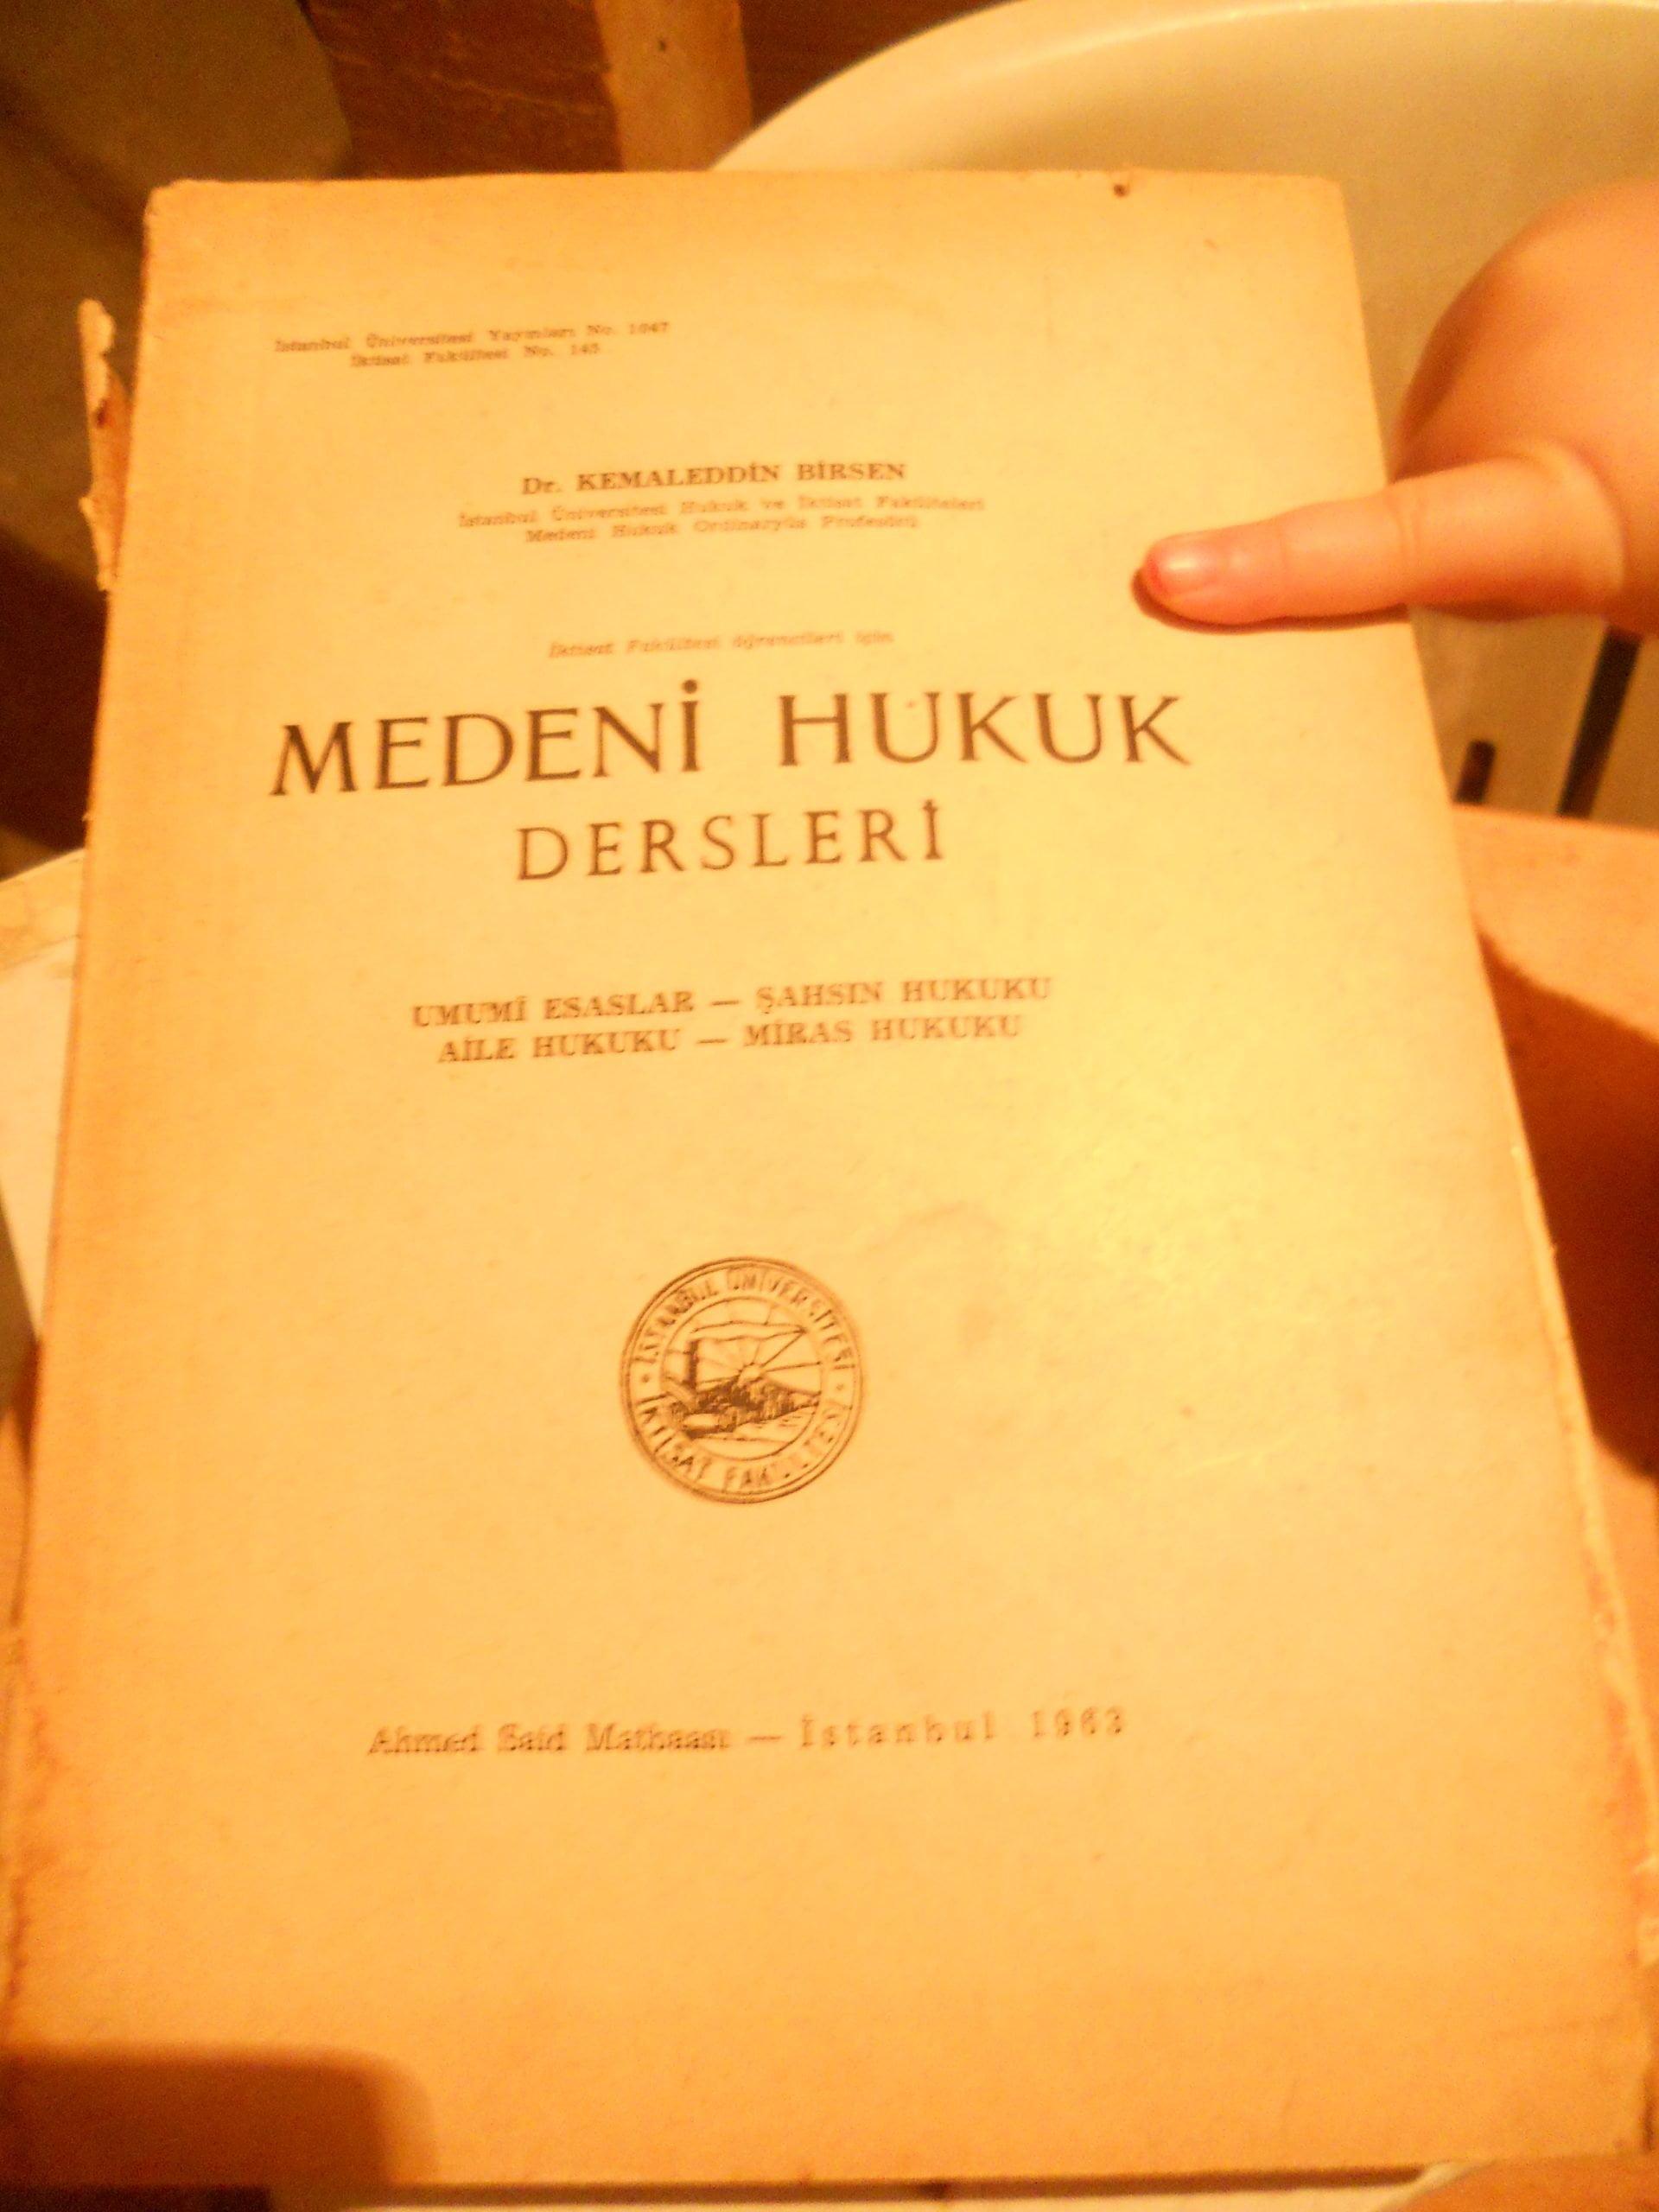 MEDENİ HUKUK DERSLERİ /Kemaleddin BİRSEN/20 TL